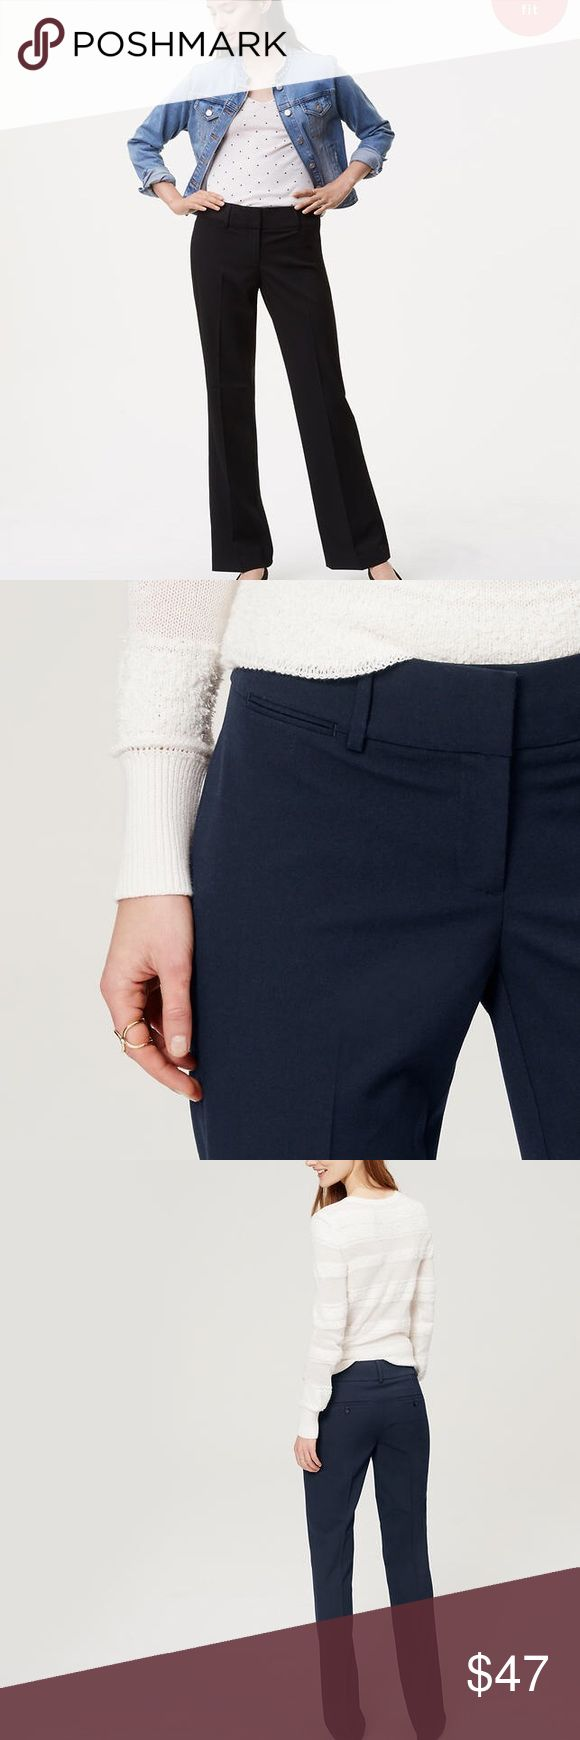 Ann Taylor Loft Tall trouser in custom stretch Ann Taylor loft Tall trouser in custom stretch in Julie Fit. NWT. 6T Ann Taylor Pants Trousers